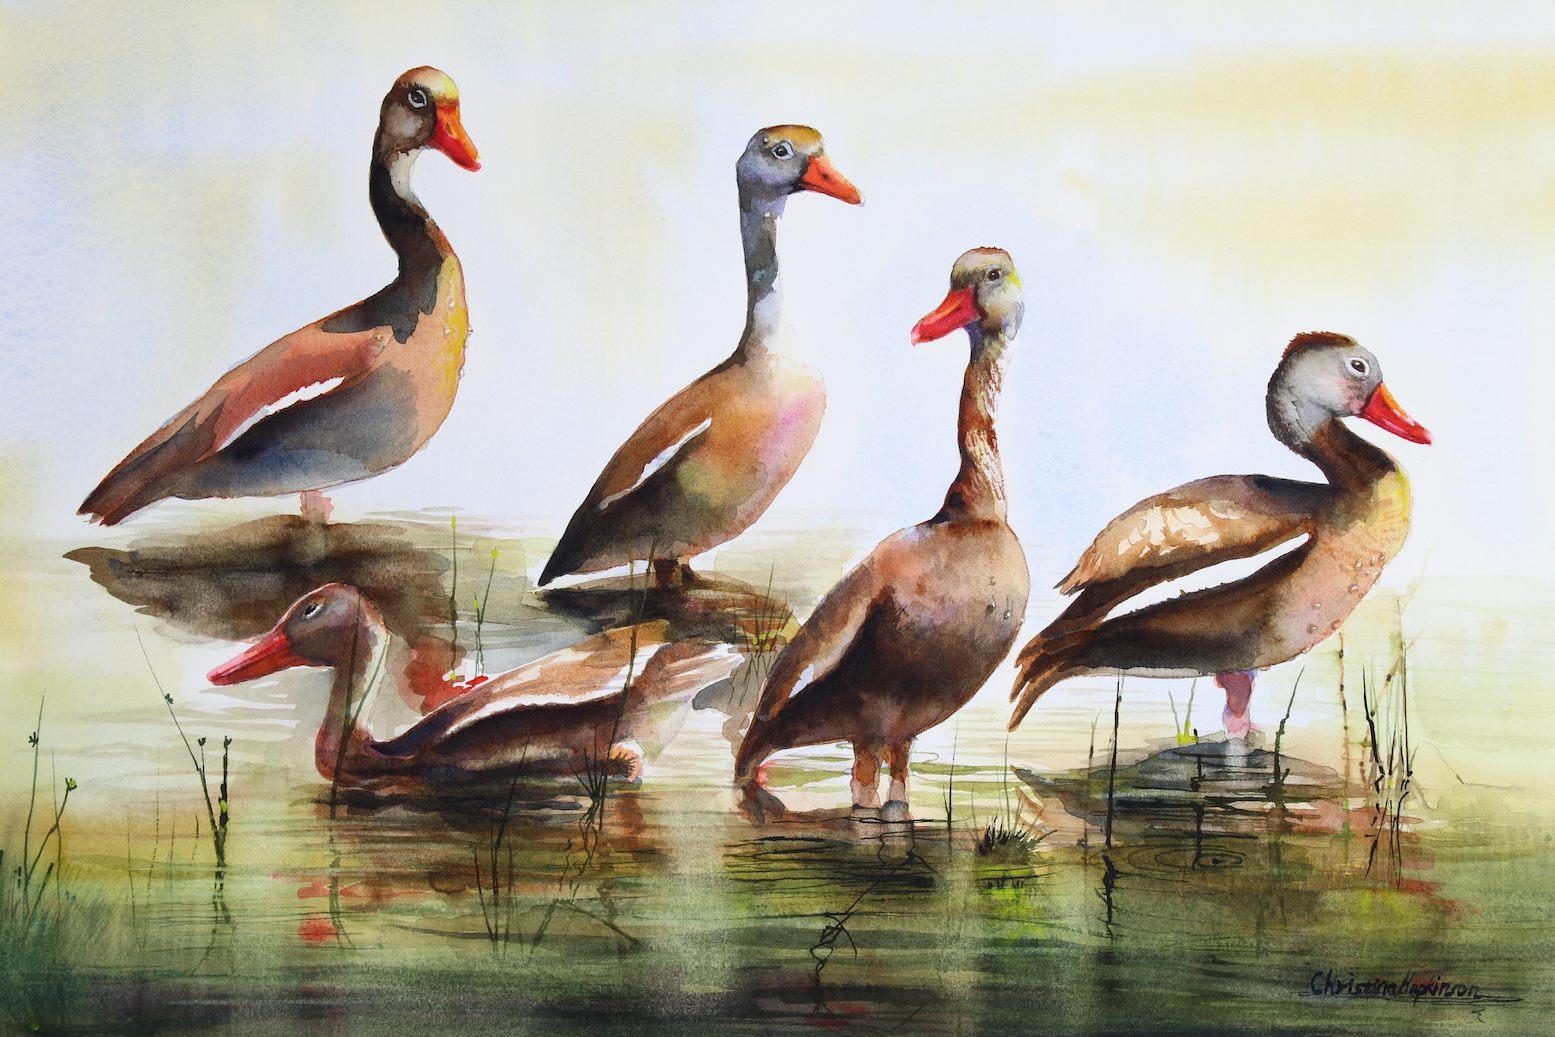 Christina Hopkinson, Black Bellied Whistling Ducks 2 - Myakka Florida